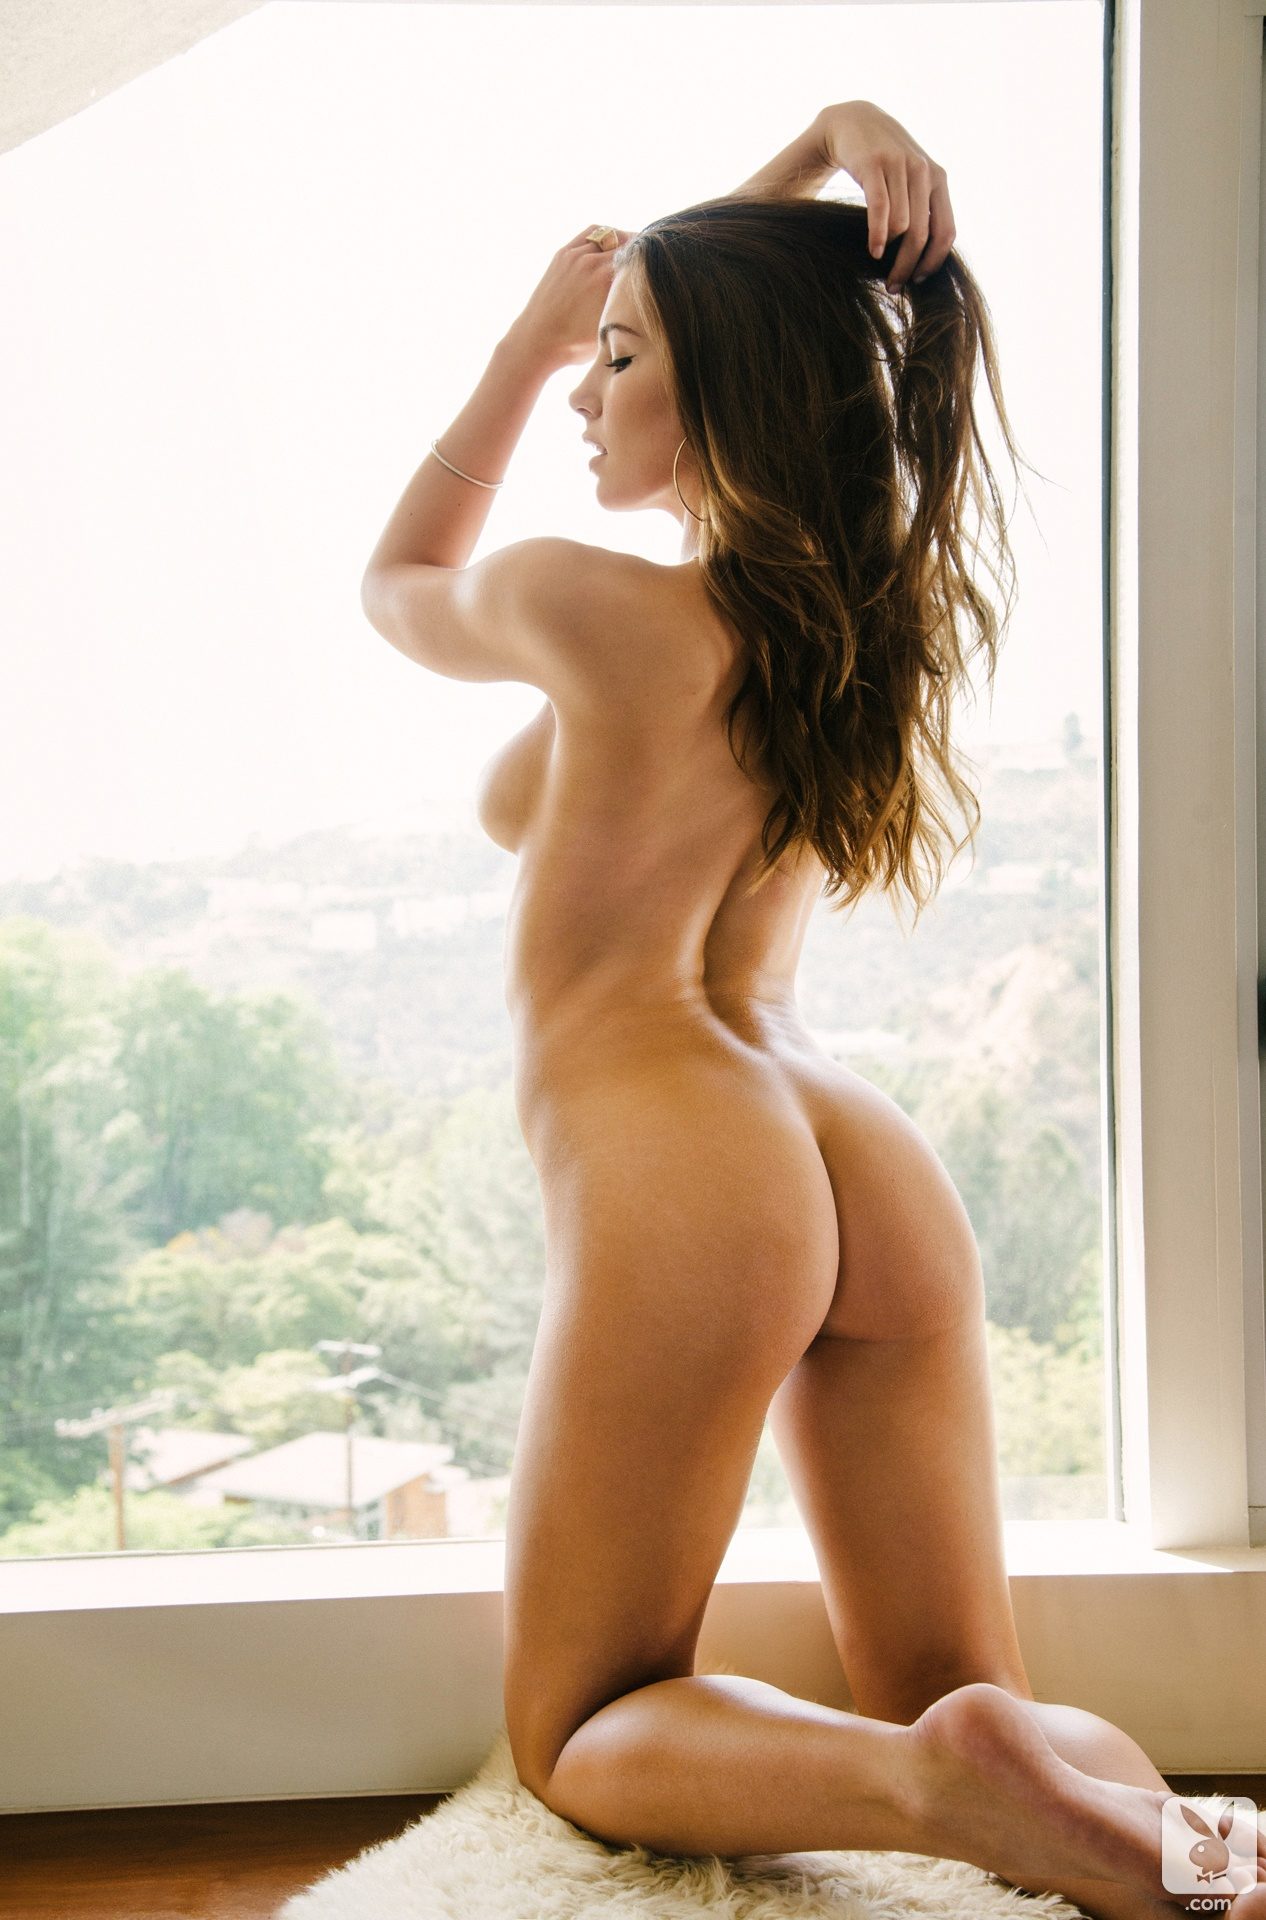 vivica a fox butt naked